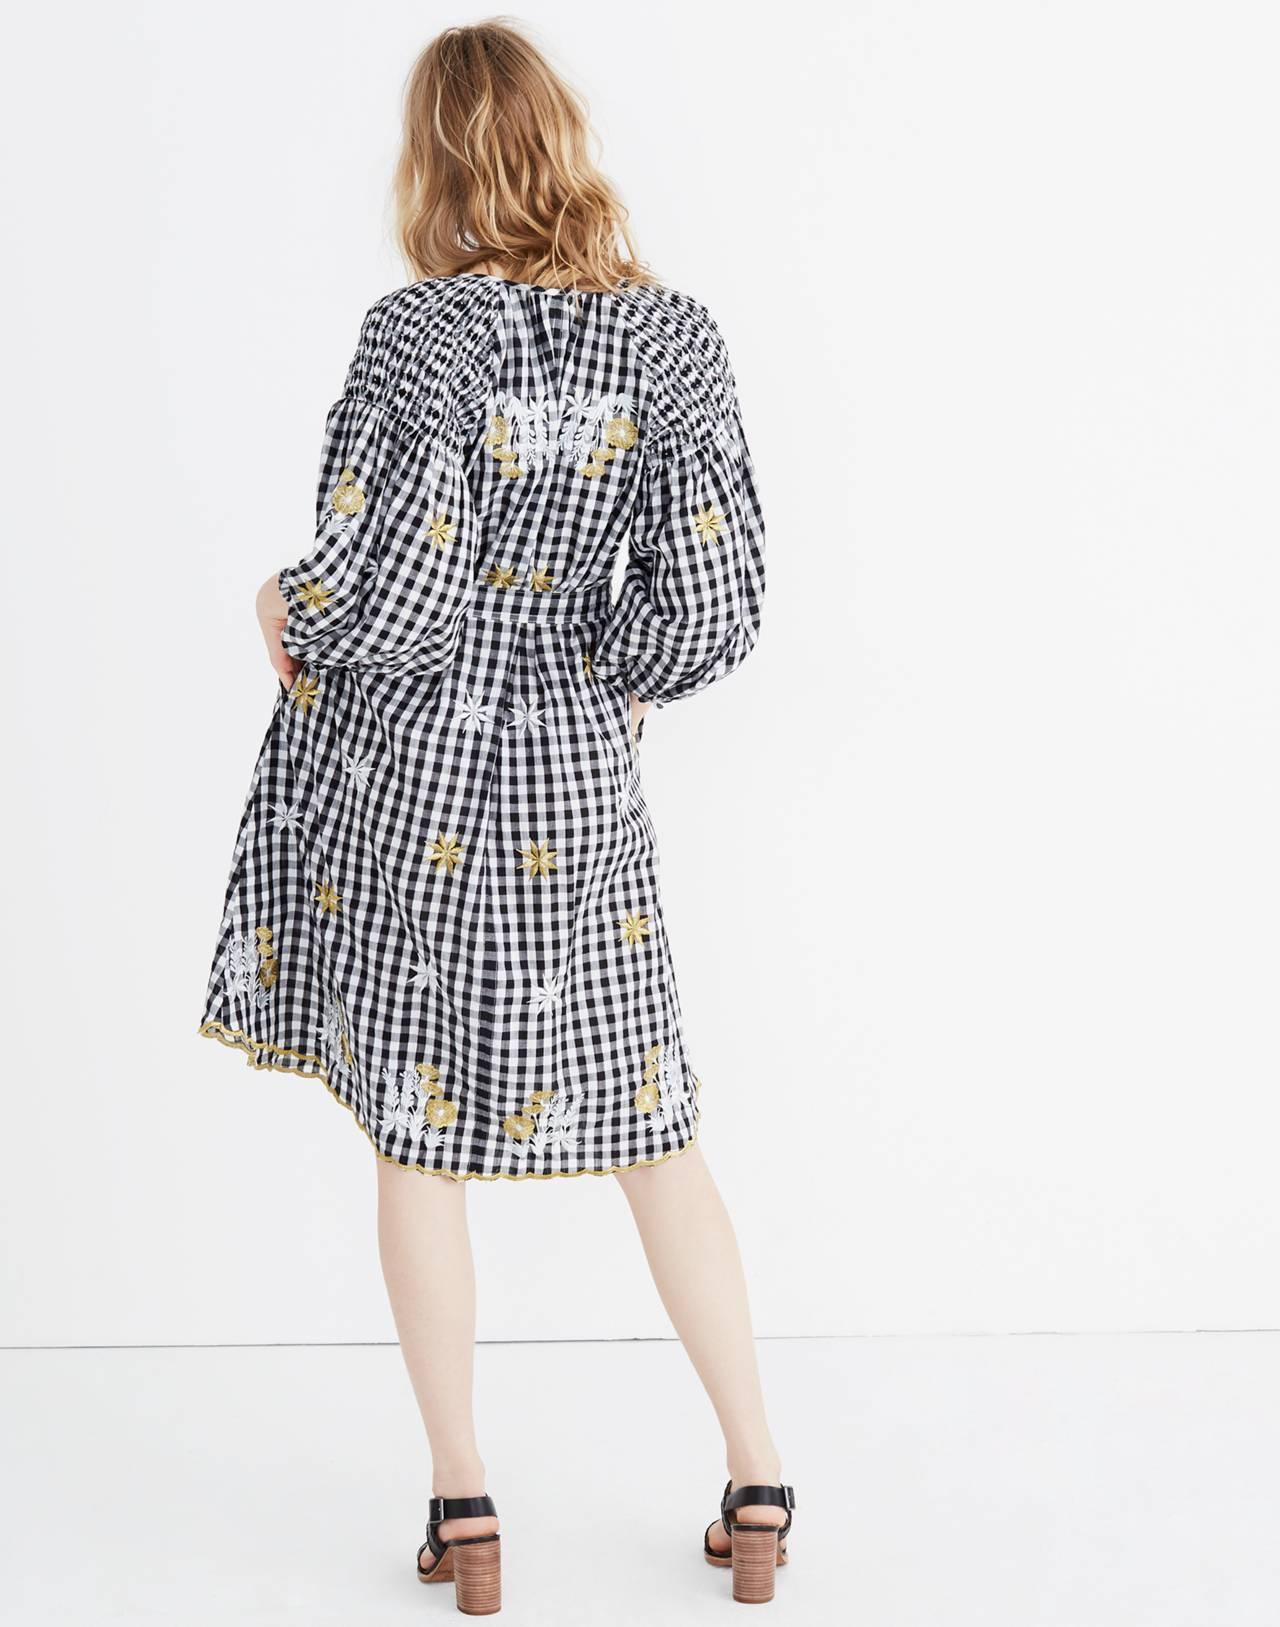 Innika Choo Smocked Gingham Avens Midi Dress in black check image 3